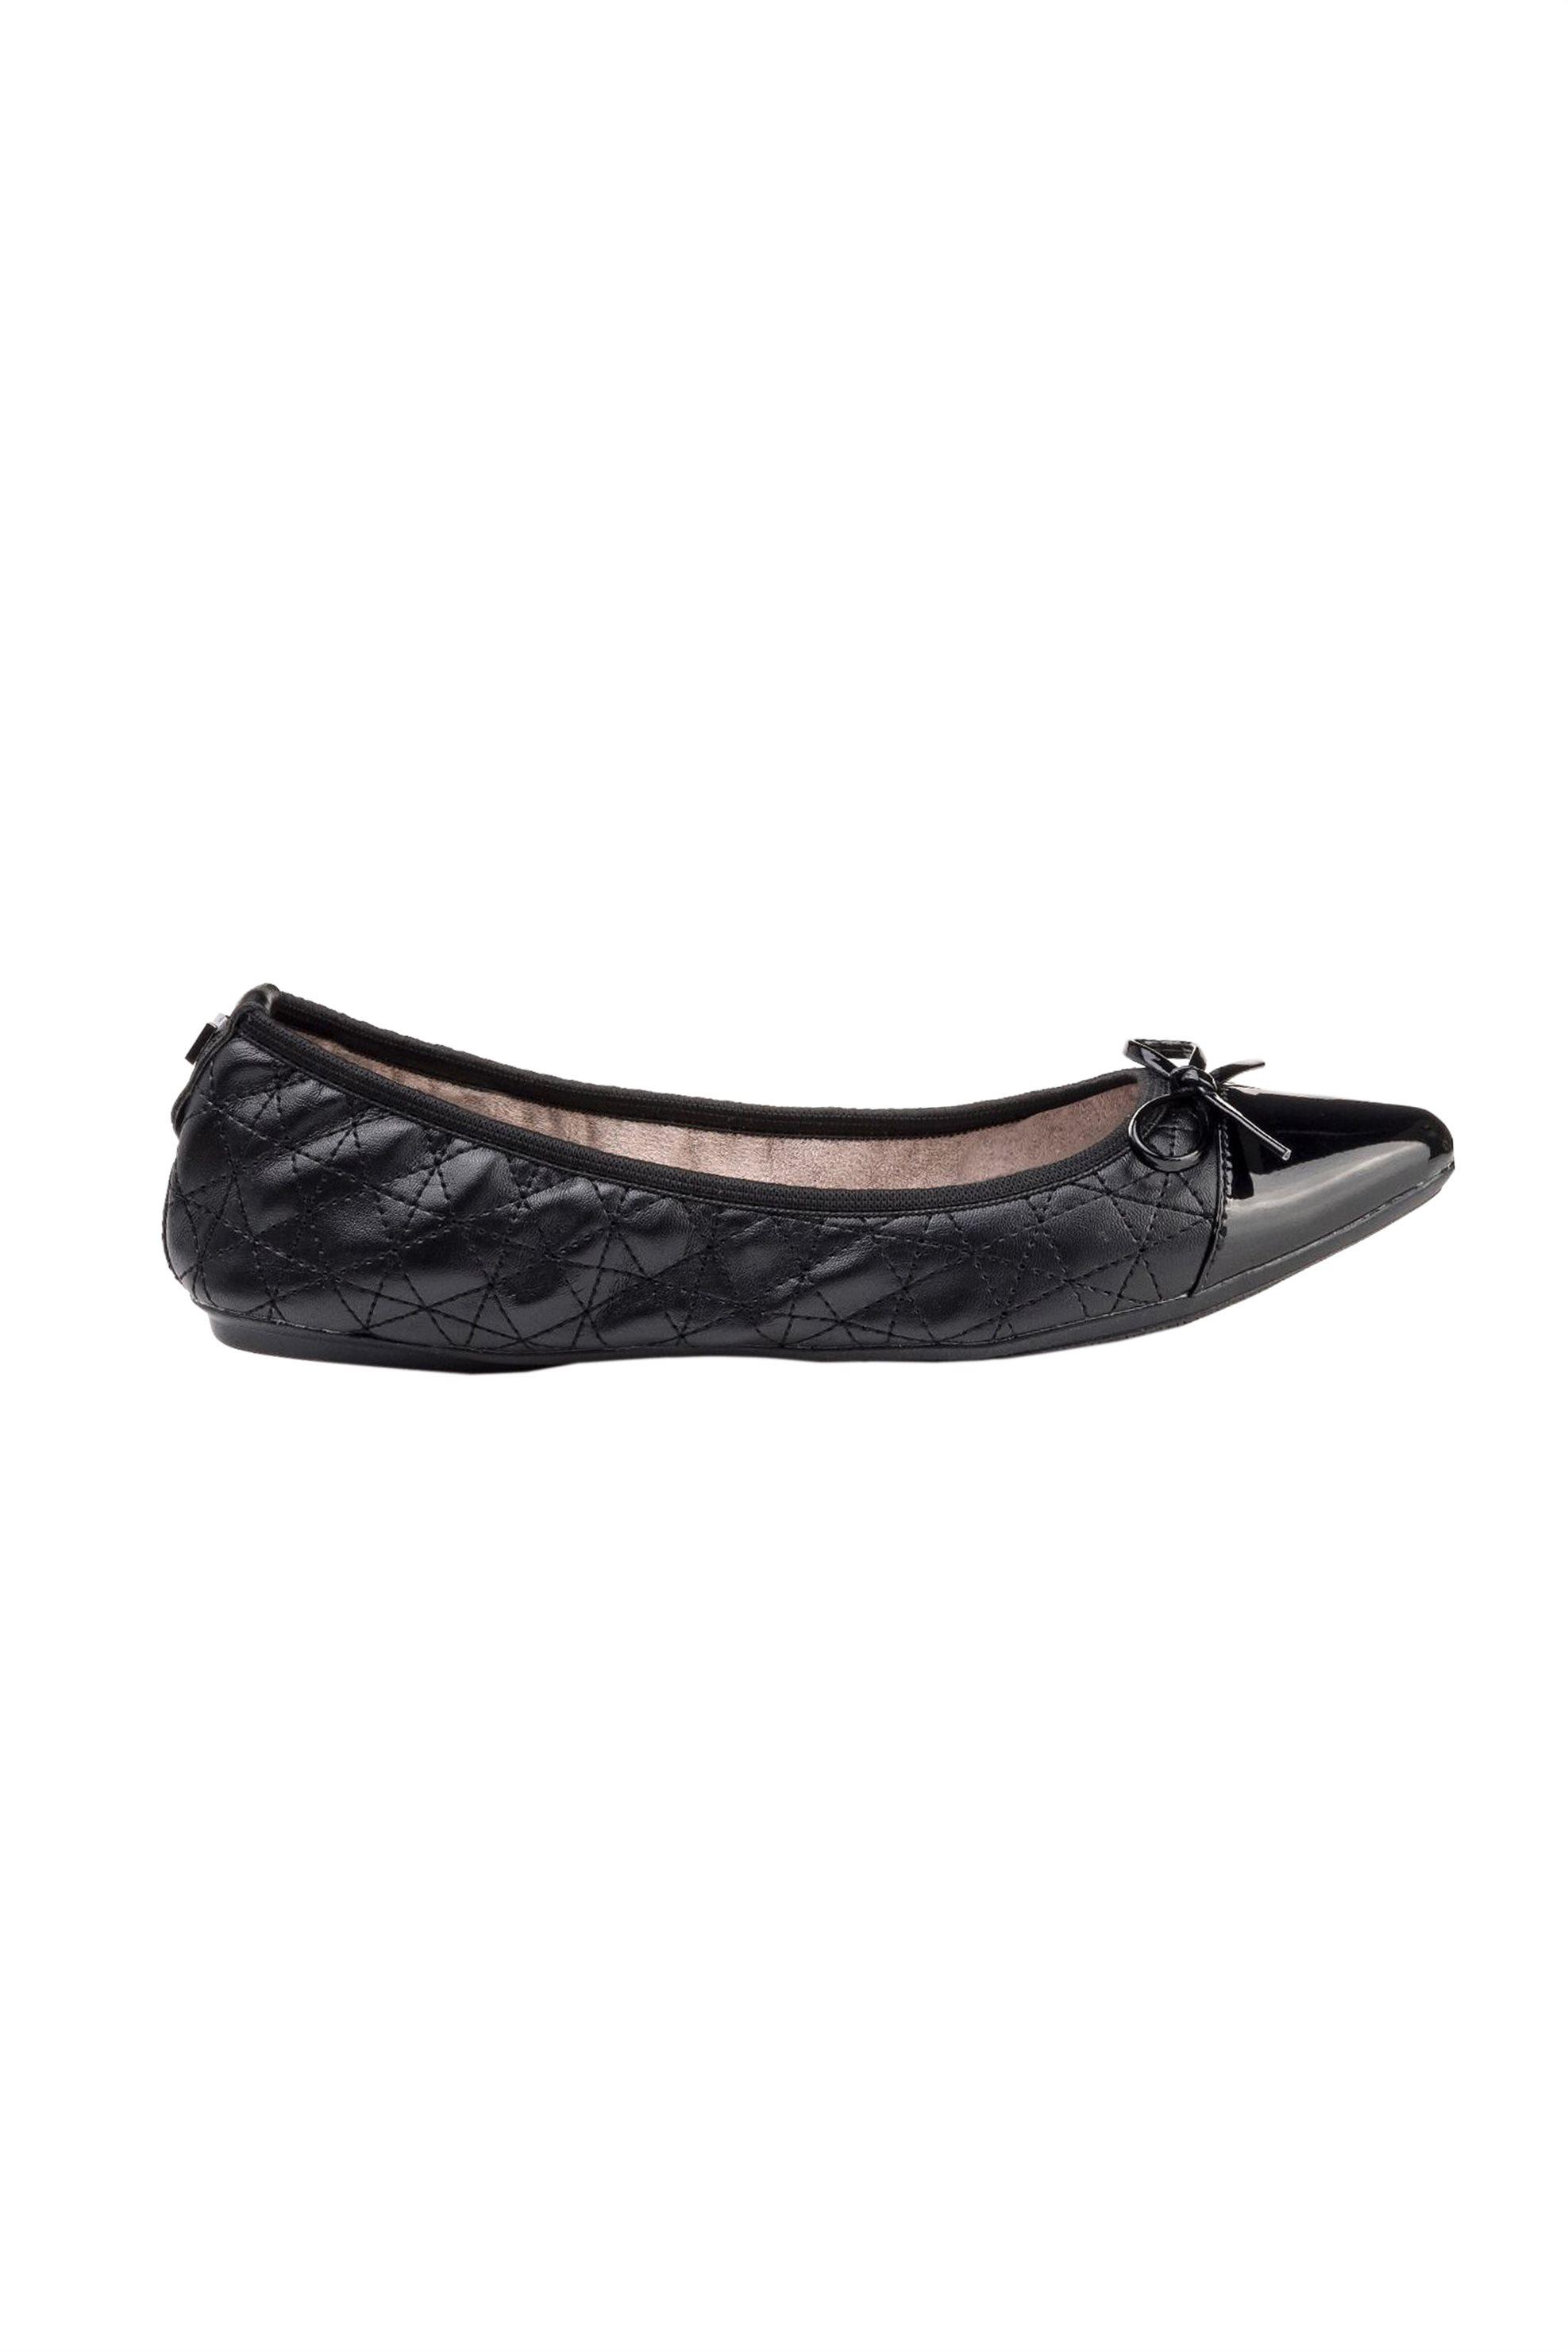 Butterfly Twists γυναικείες μπαλαρίνες Holly – 218894-HOLLY – Μαύρο